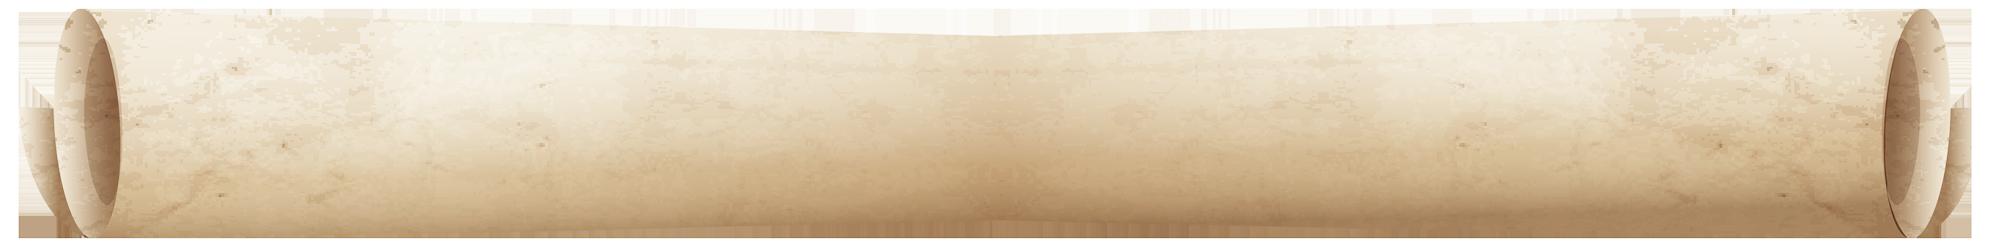 Pergamentrolle Hintergrundbild oben